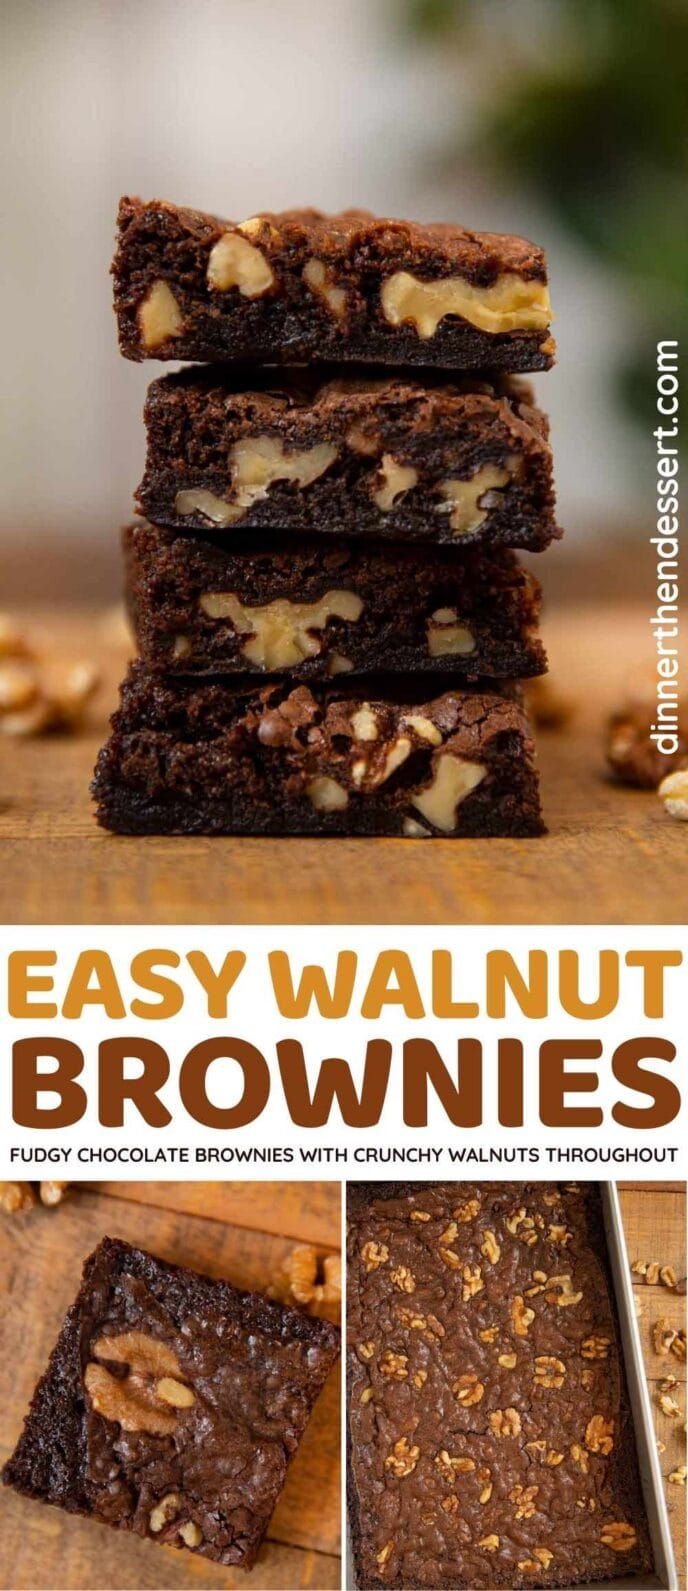 Walnut Brownies collage